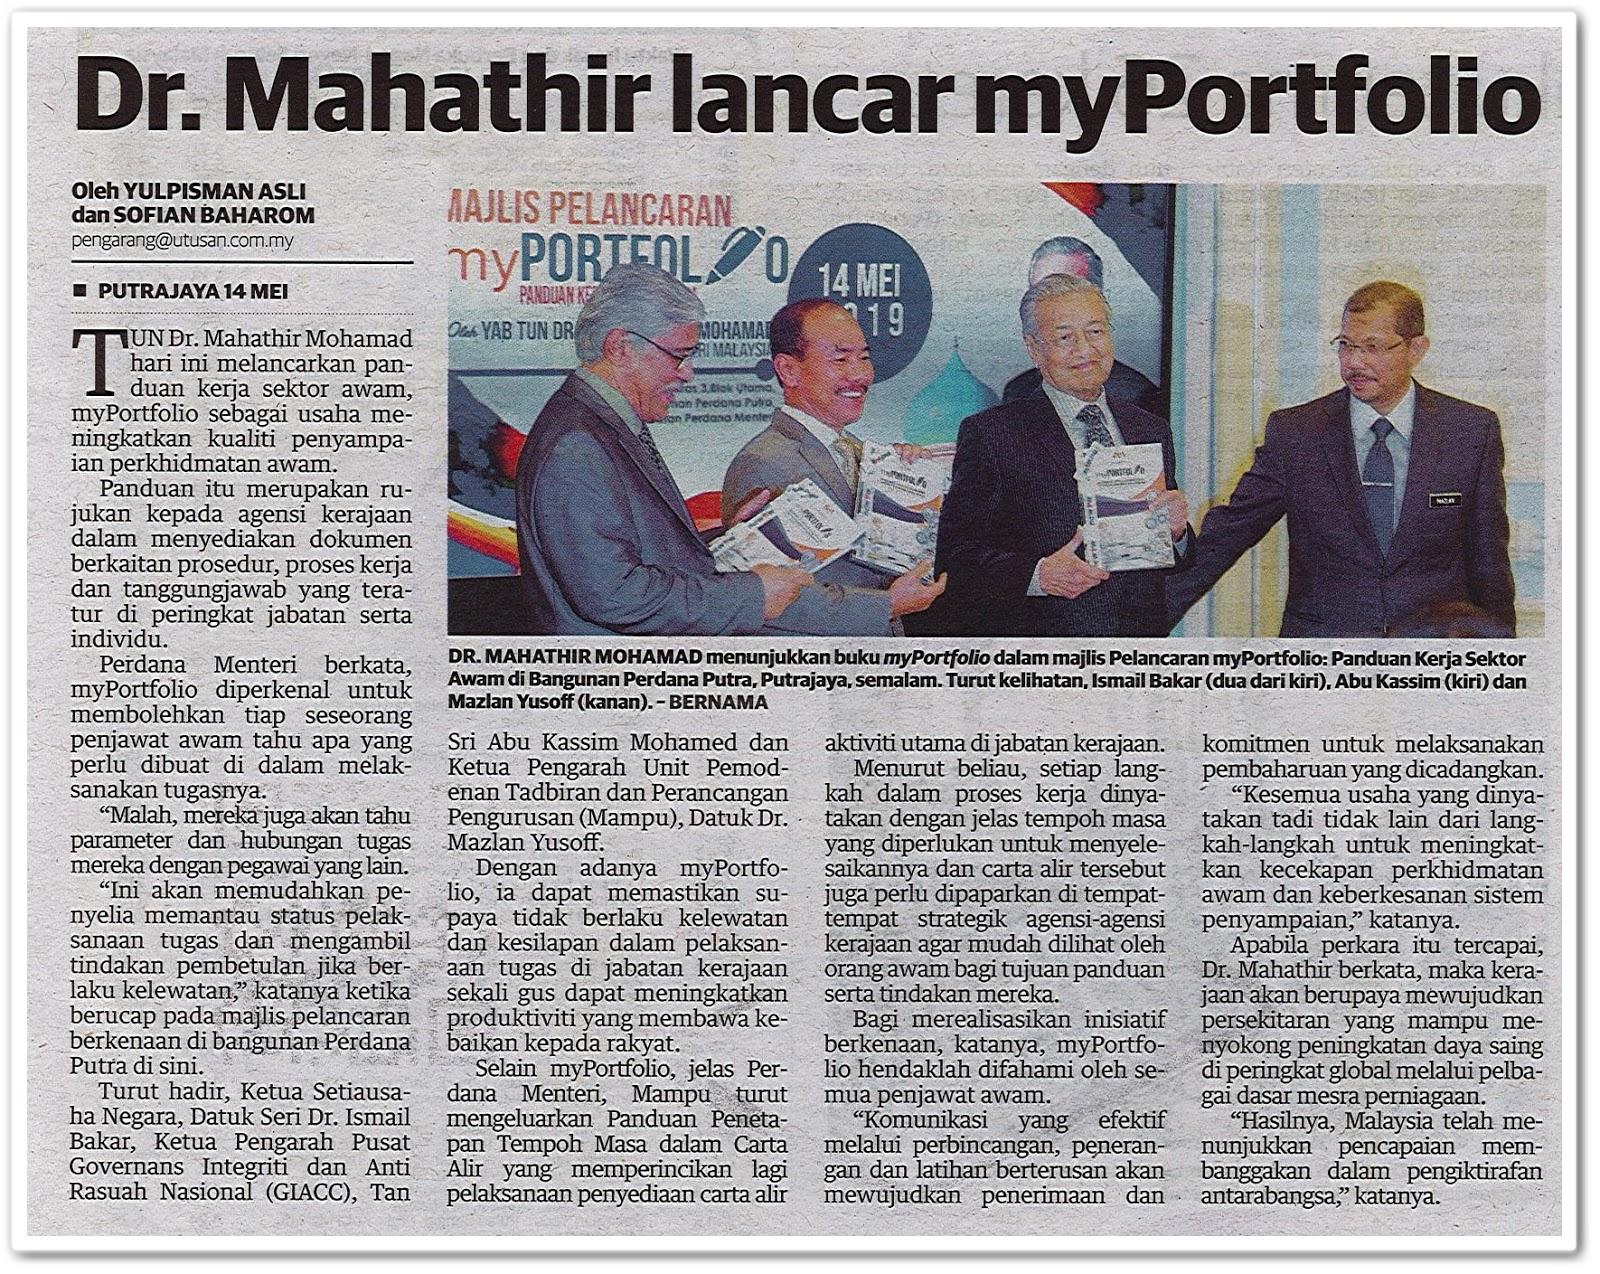 Dr. Mahathir lancar MyPortfolio - Keratan akhbar Utusan Malaysia 15 Mei 2019